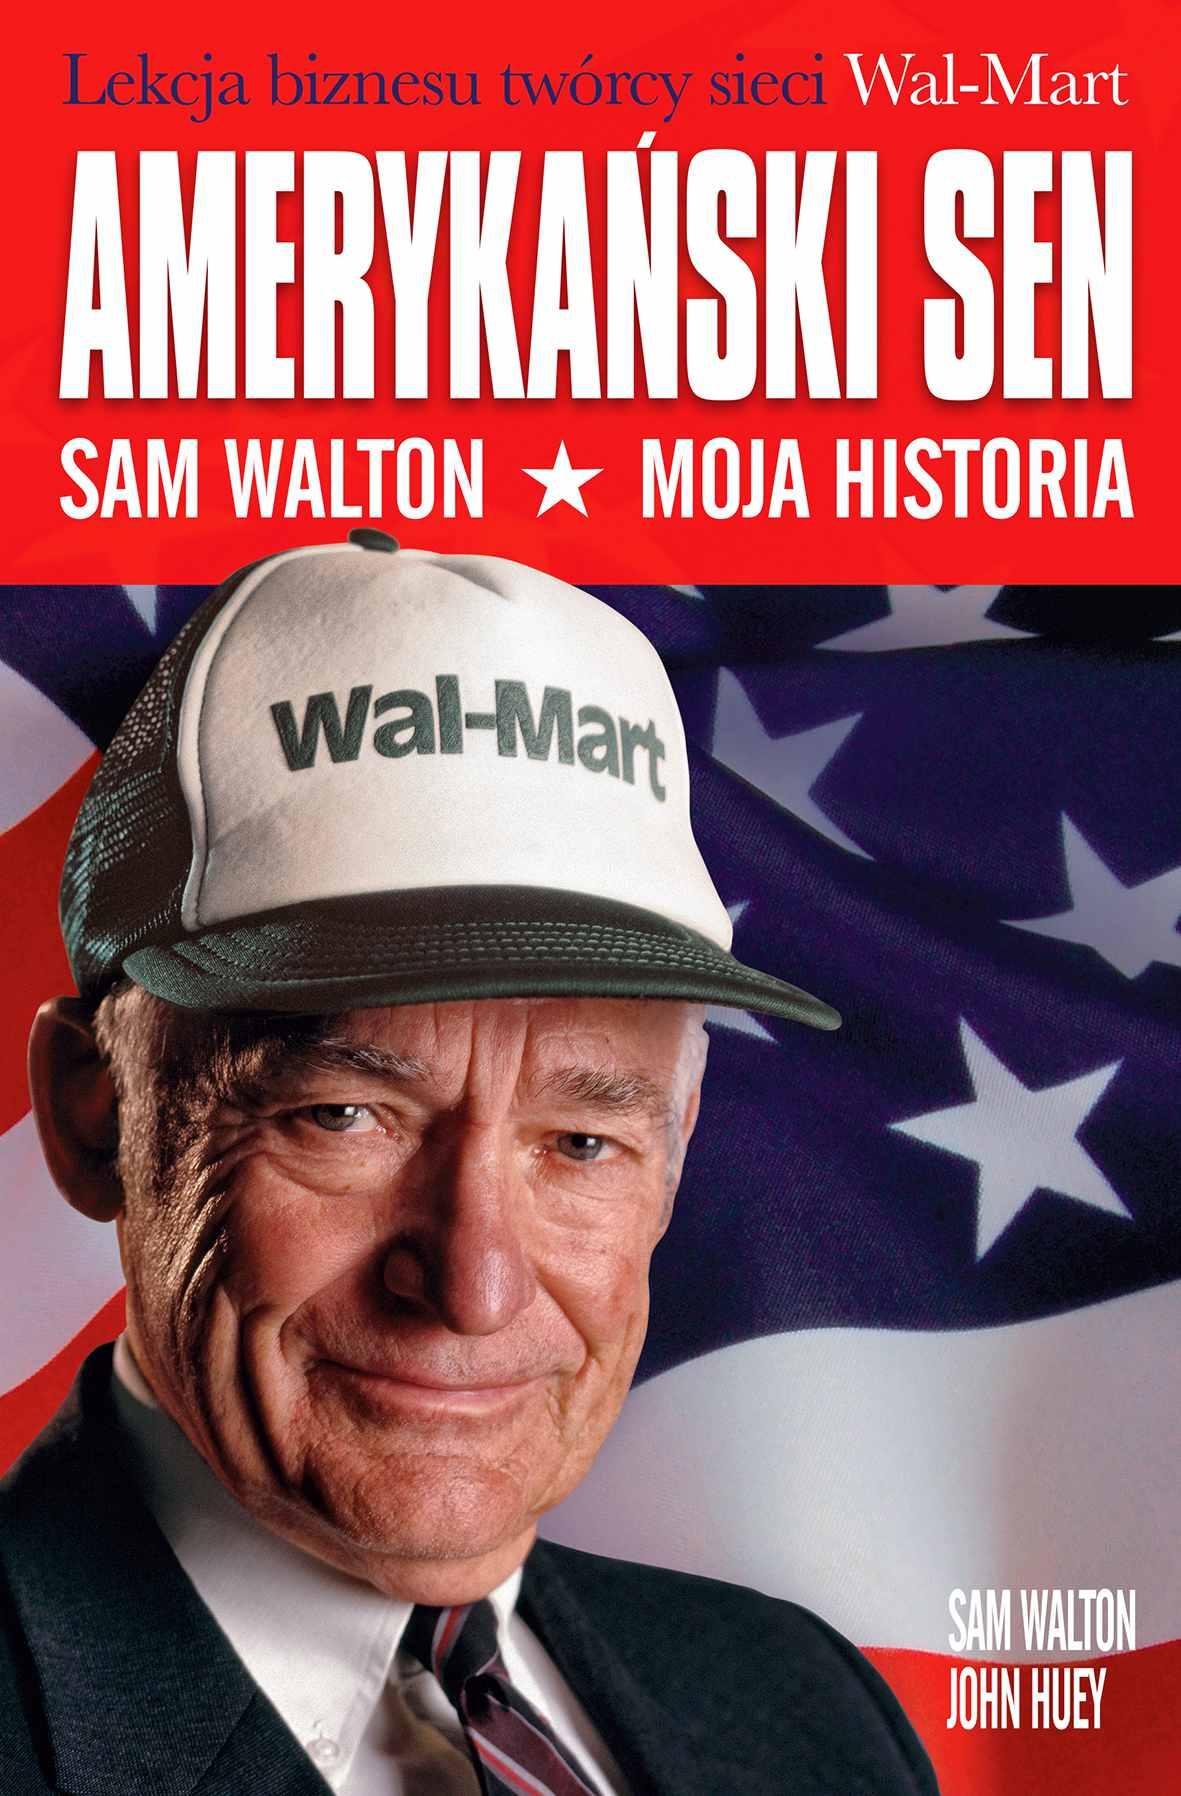 Amerykański sen. Sam Walton. Moja historia - Ebook (Książka EPUB) do pobrania w formacie EPUB